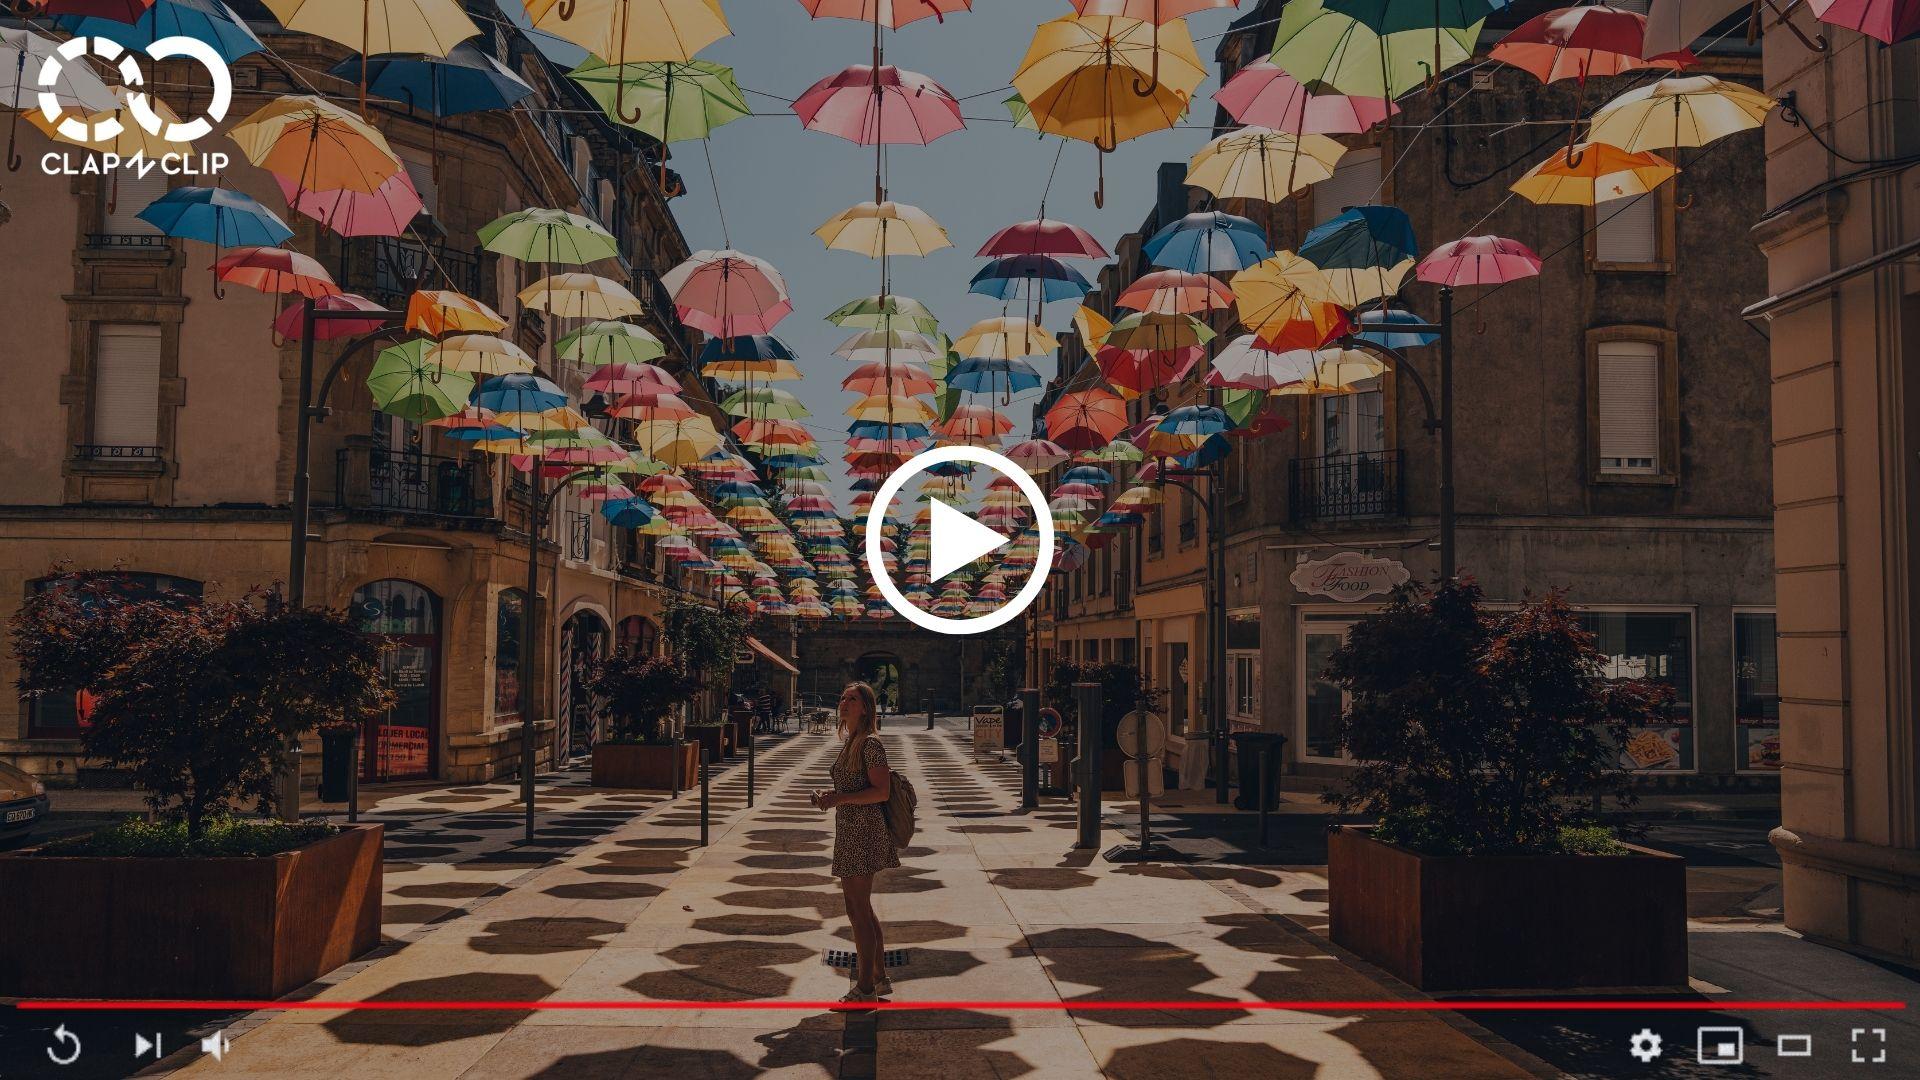 tourisme video communication